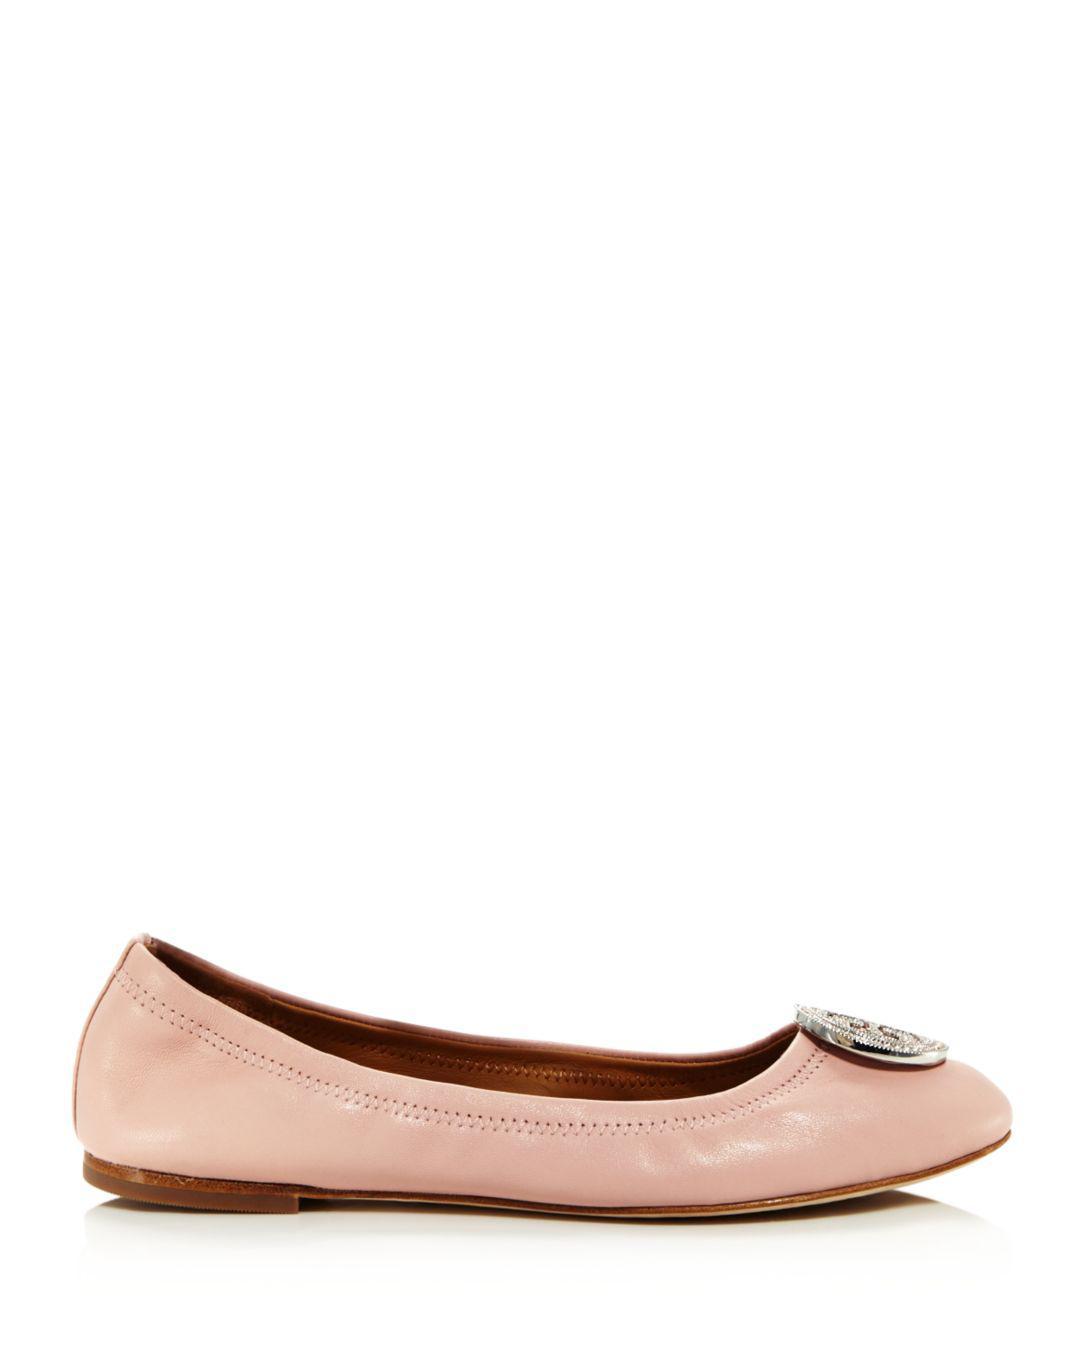 9402fae876f6 Lyst - Tory Burch Women s Liana Round Toe Rhinestone Logo Leather Ballet  Flats